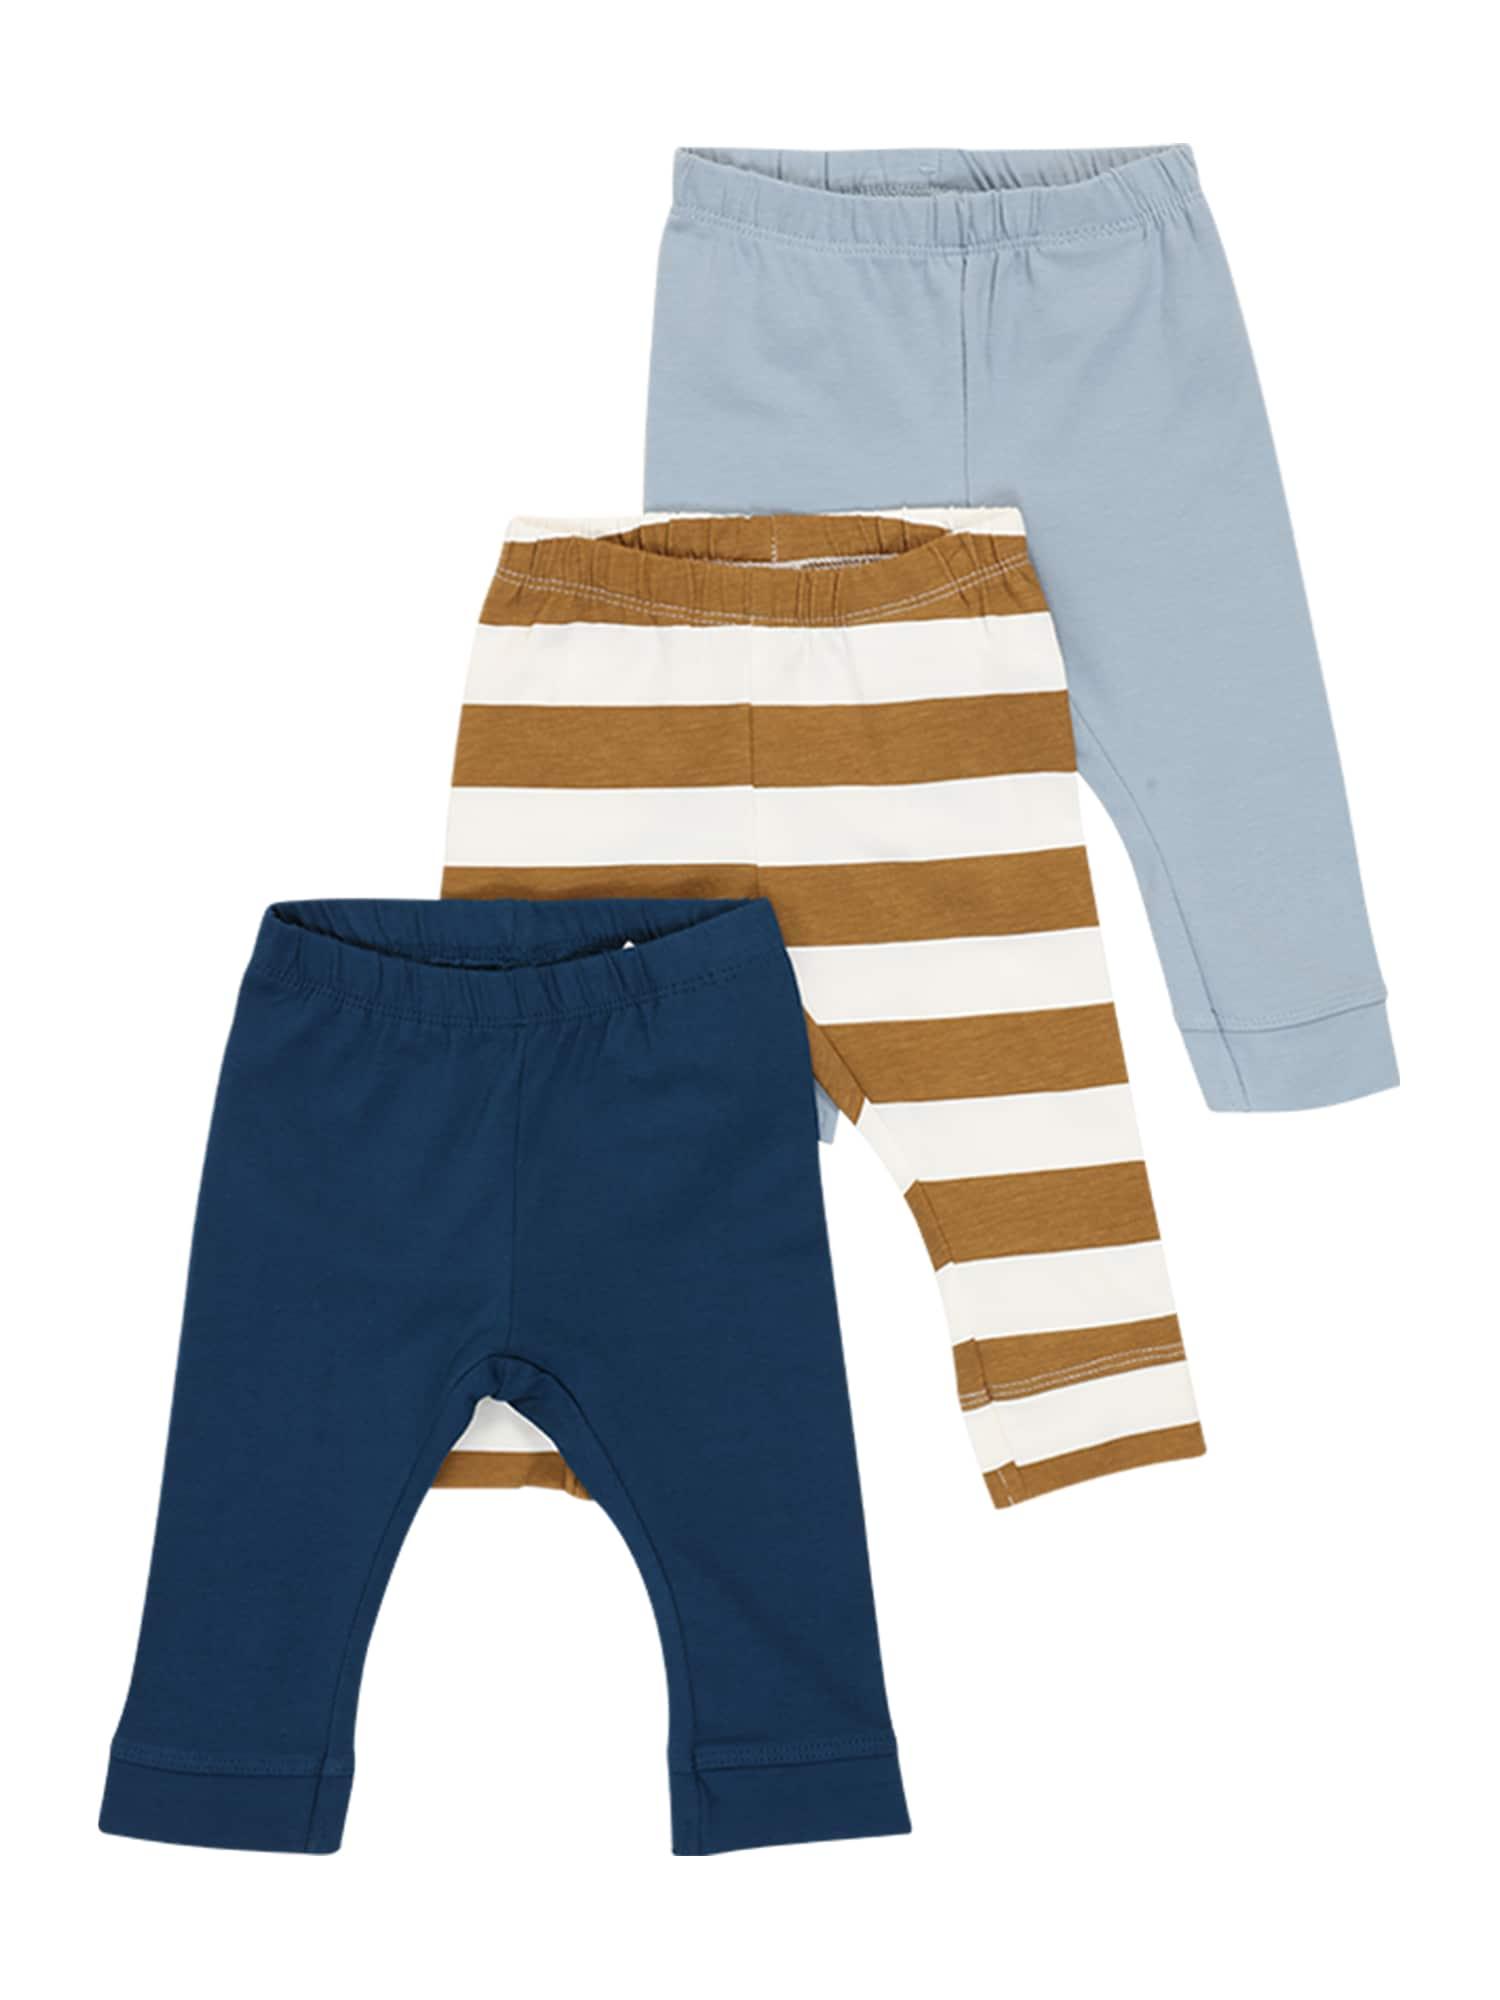 NAME IT Miego kostiumas 'John' balta / ruda / šviesiai mėlyna / tamsiai mėlyna